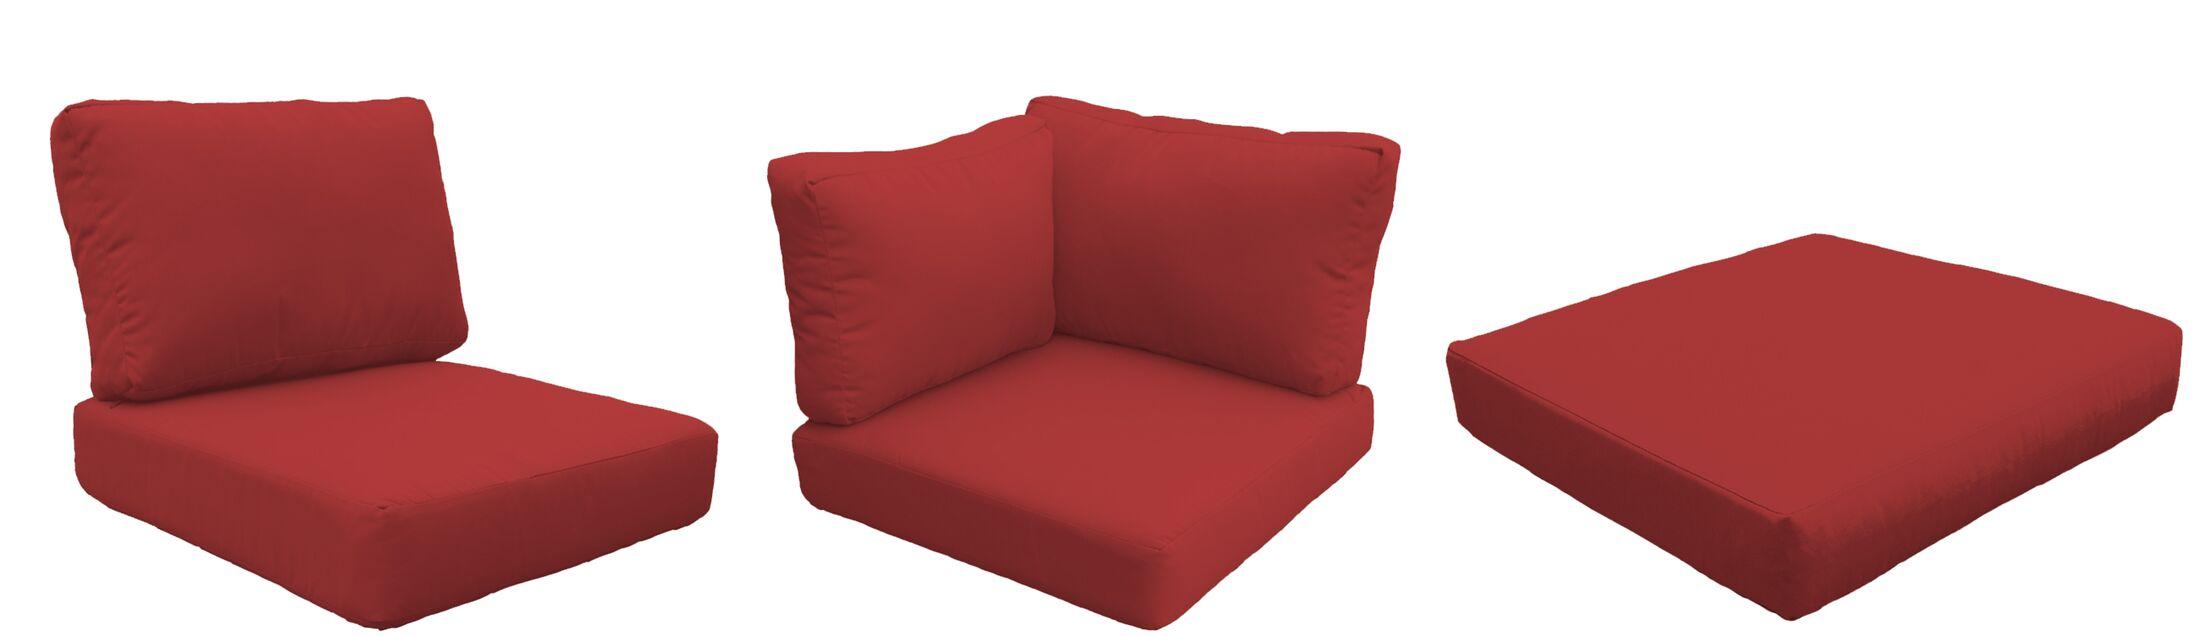 East Village Outdoor 25 Piece Lounge Chair Cushion Set Fabric: Terracotta